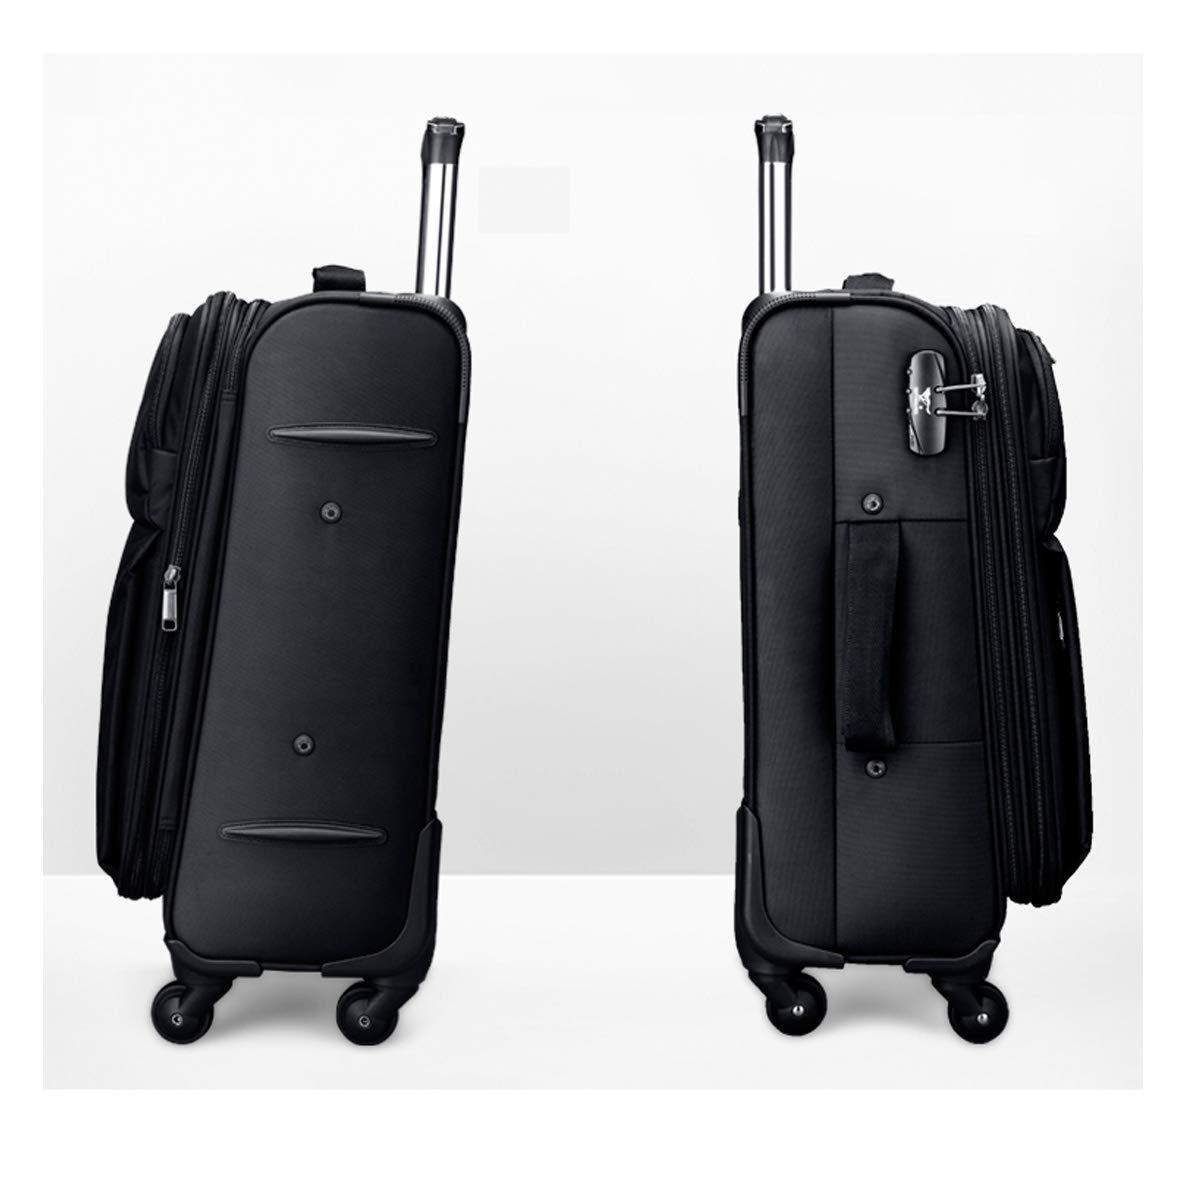 Train Box Travel Organizer Trolley case 20 inches Bahaowenjuguan Travel Suitcase Simple Soft Travel Bag